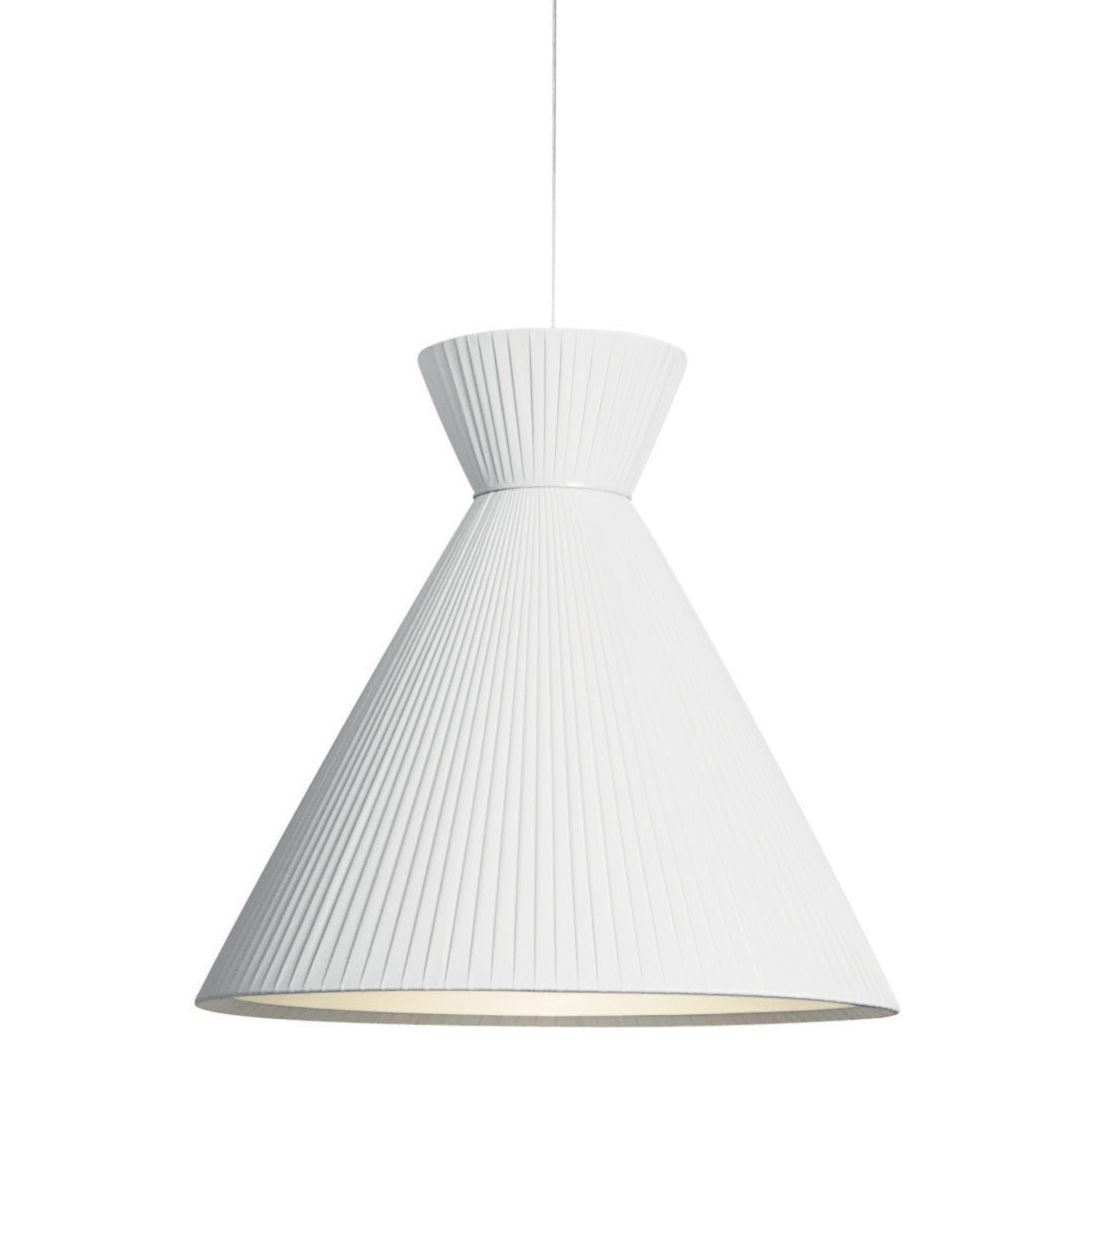 Luminaire - Suspensions - Suspension Mandarina / Tissu plissé - Ø 43 x H 43 cm - Carpyen - Blanc - Tissu polyester